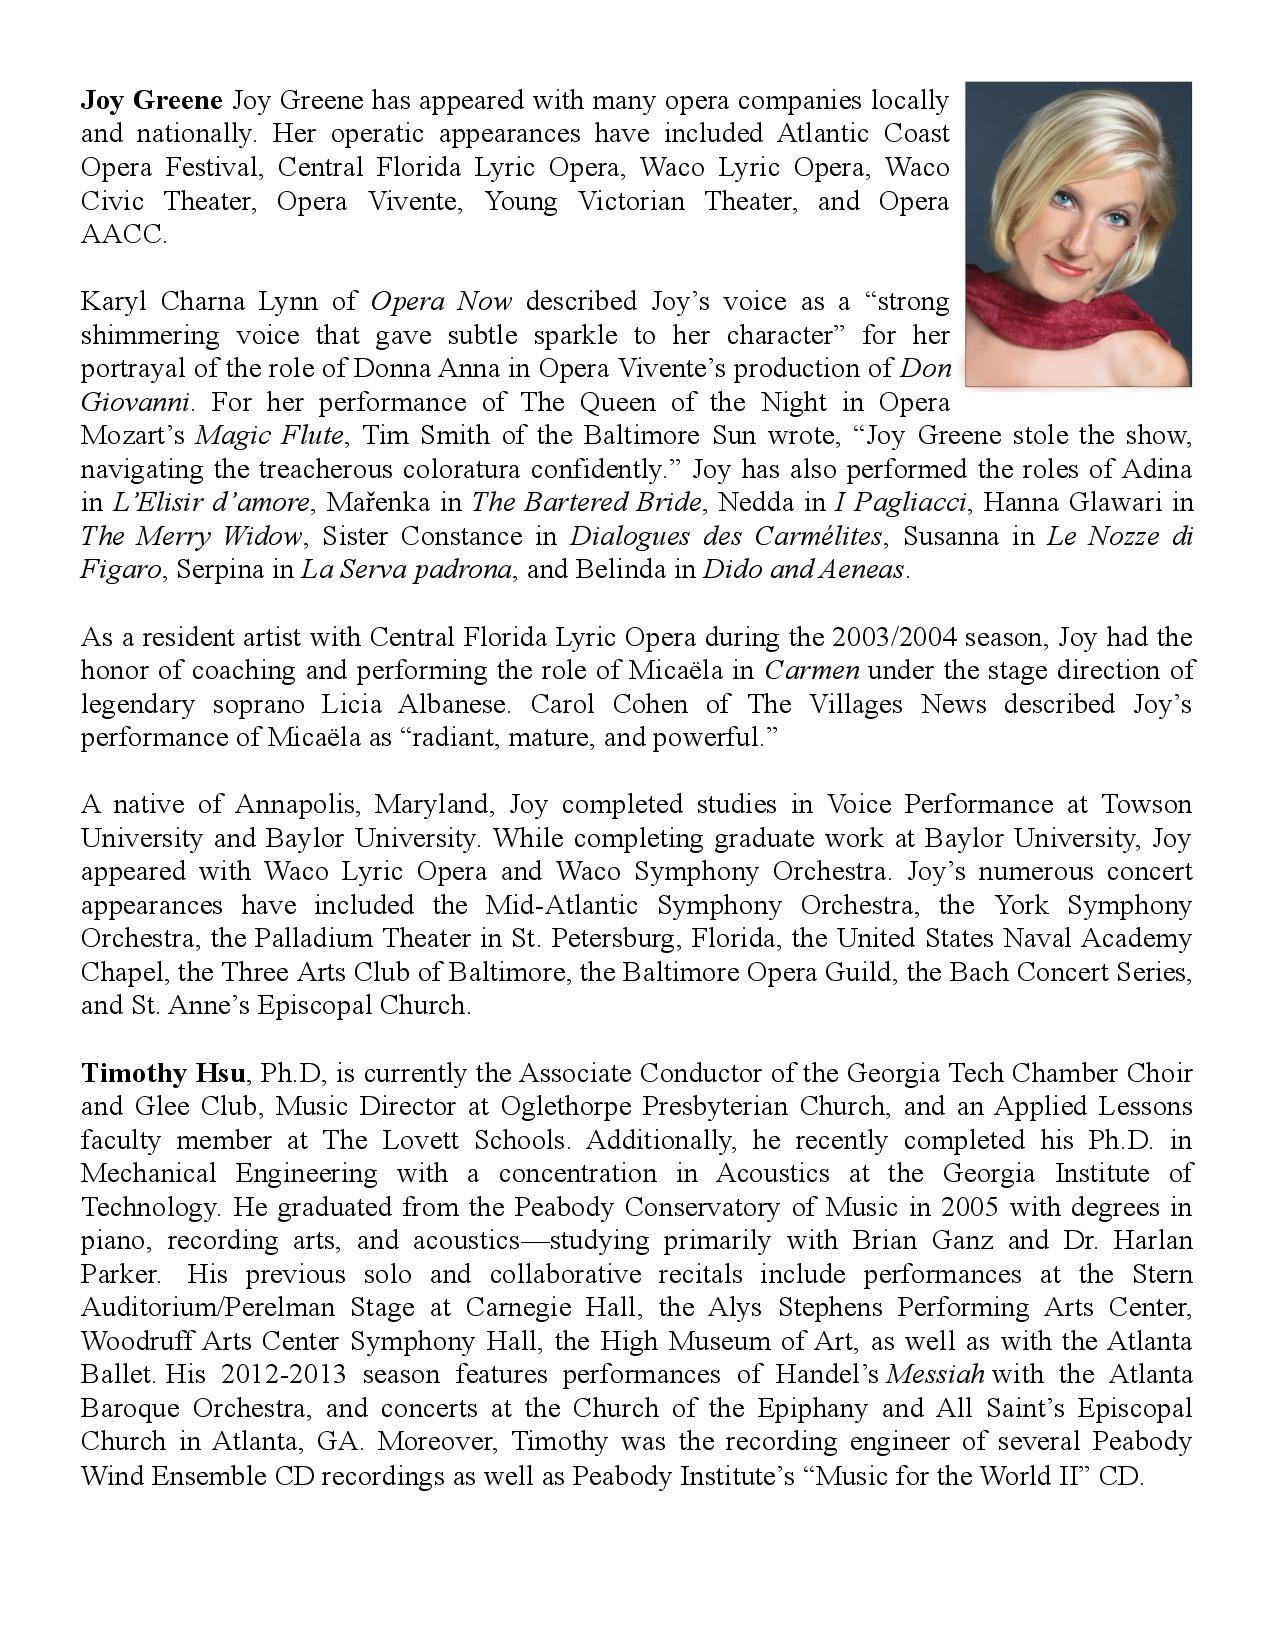 2012-12-16 Program Draft - 2012-12-11 v2-page-012.jpg